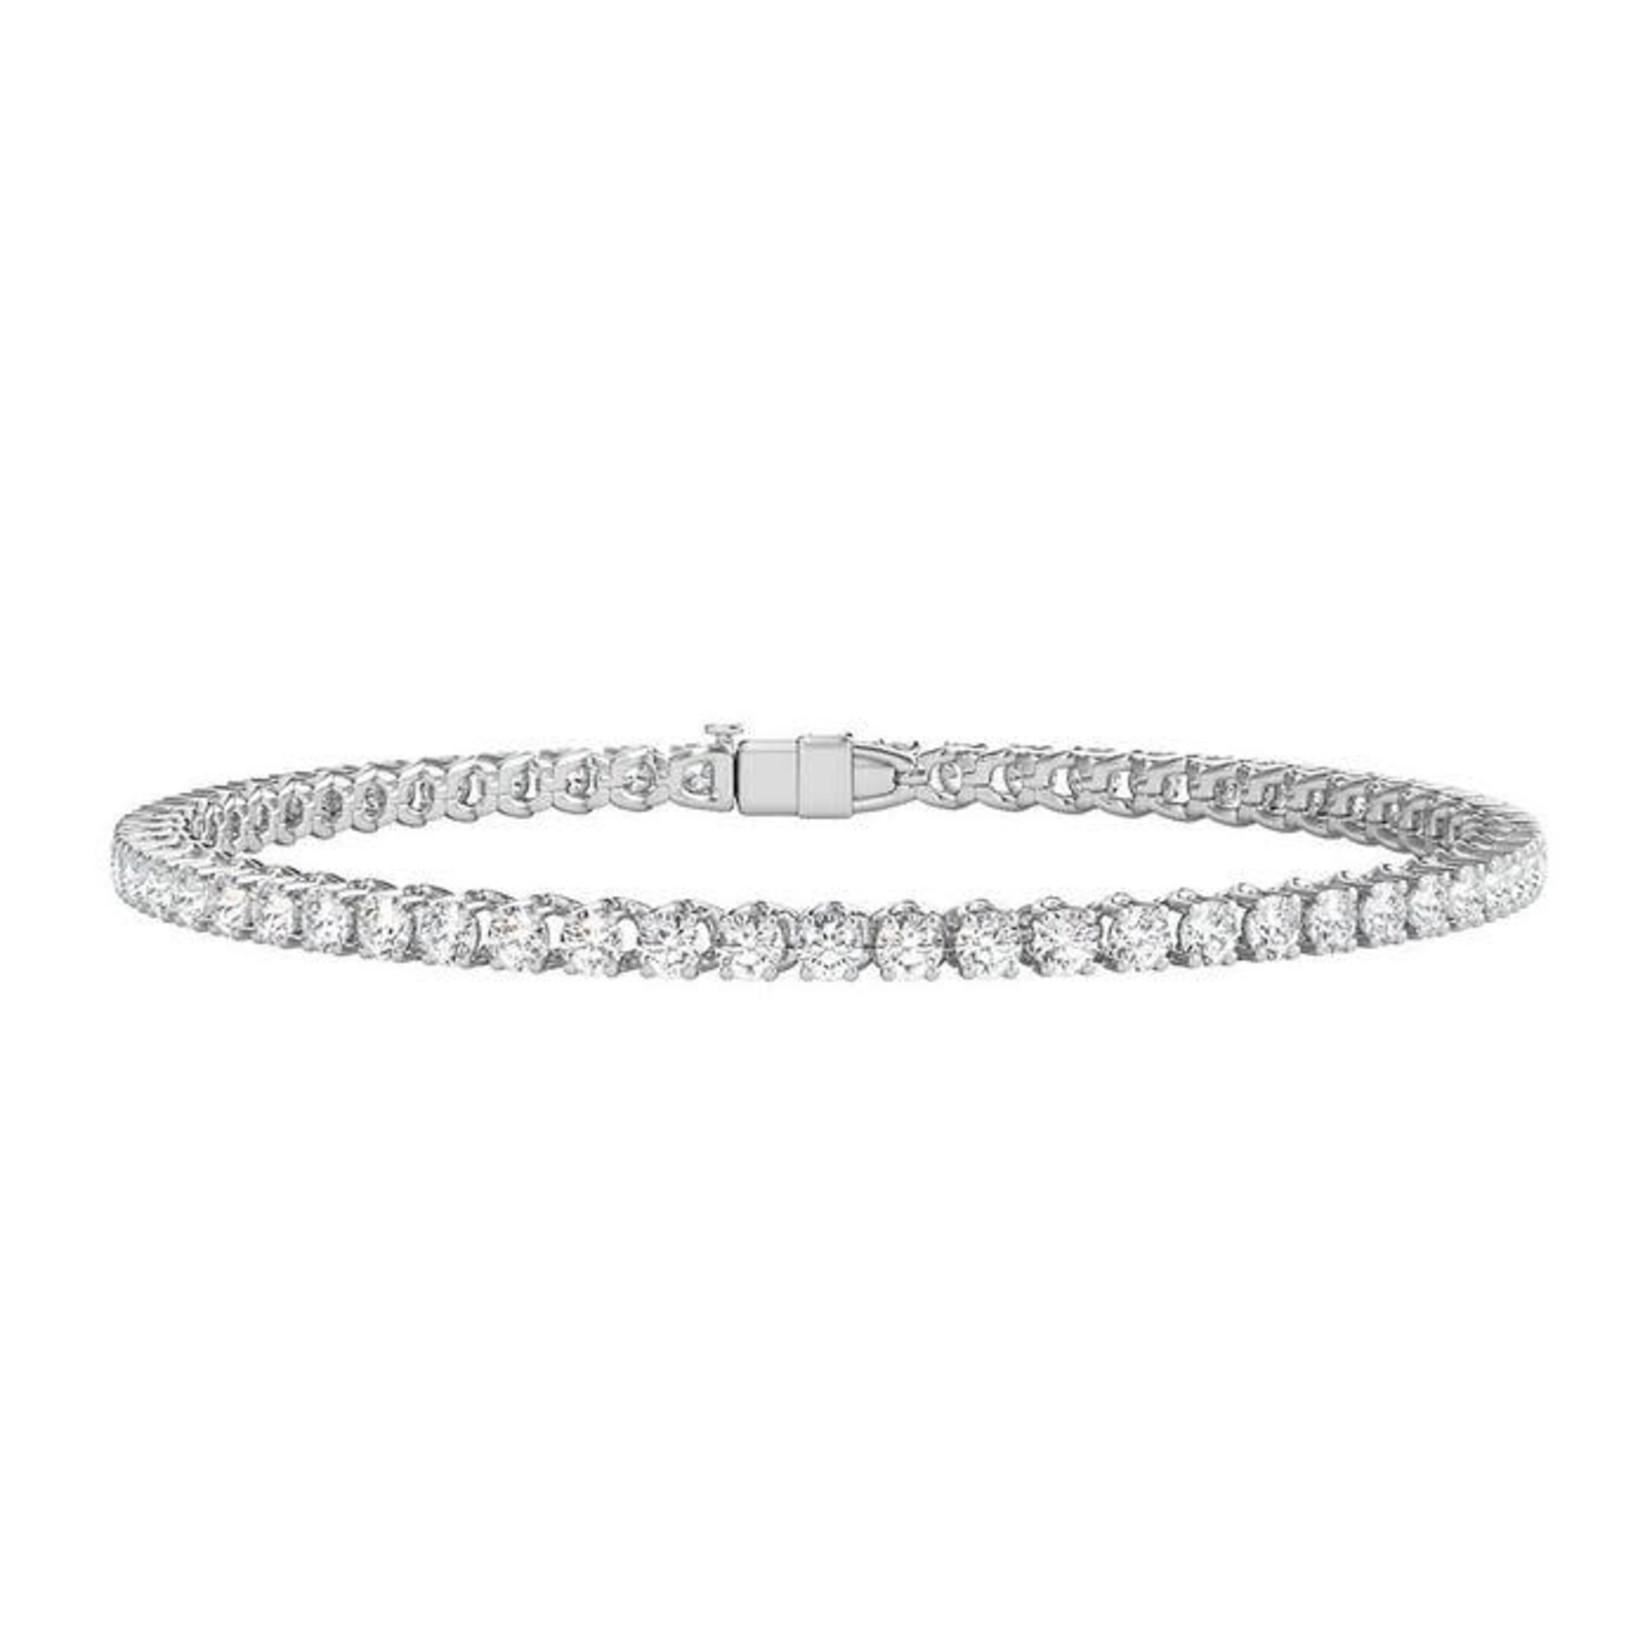 14KW Gold Diamond 2.35CTW Tennis Bracelet